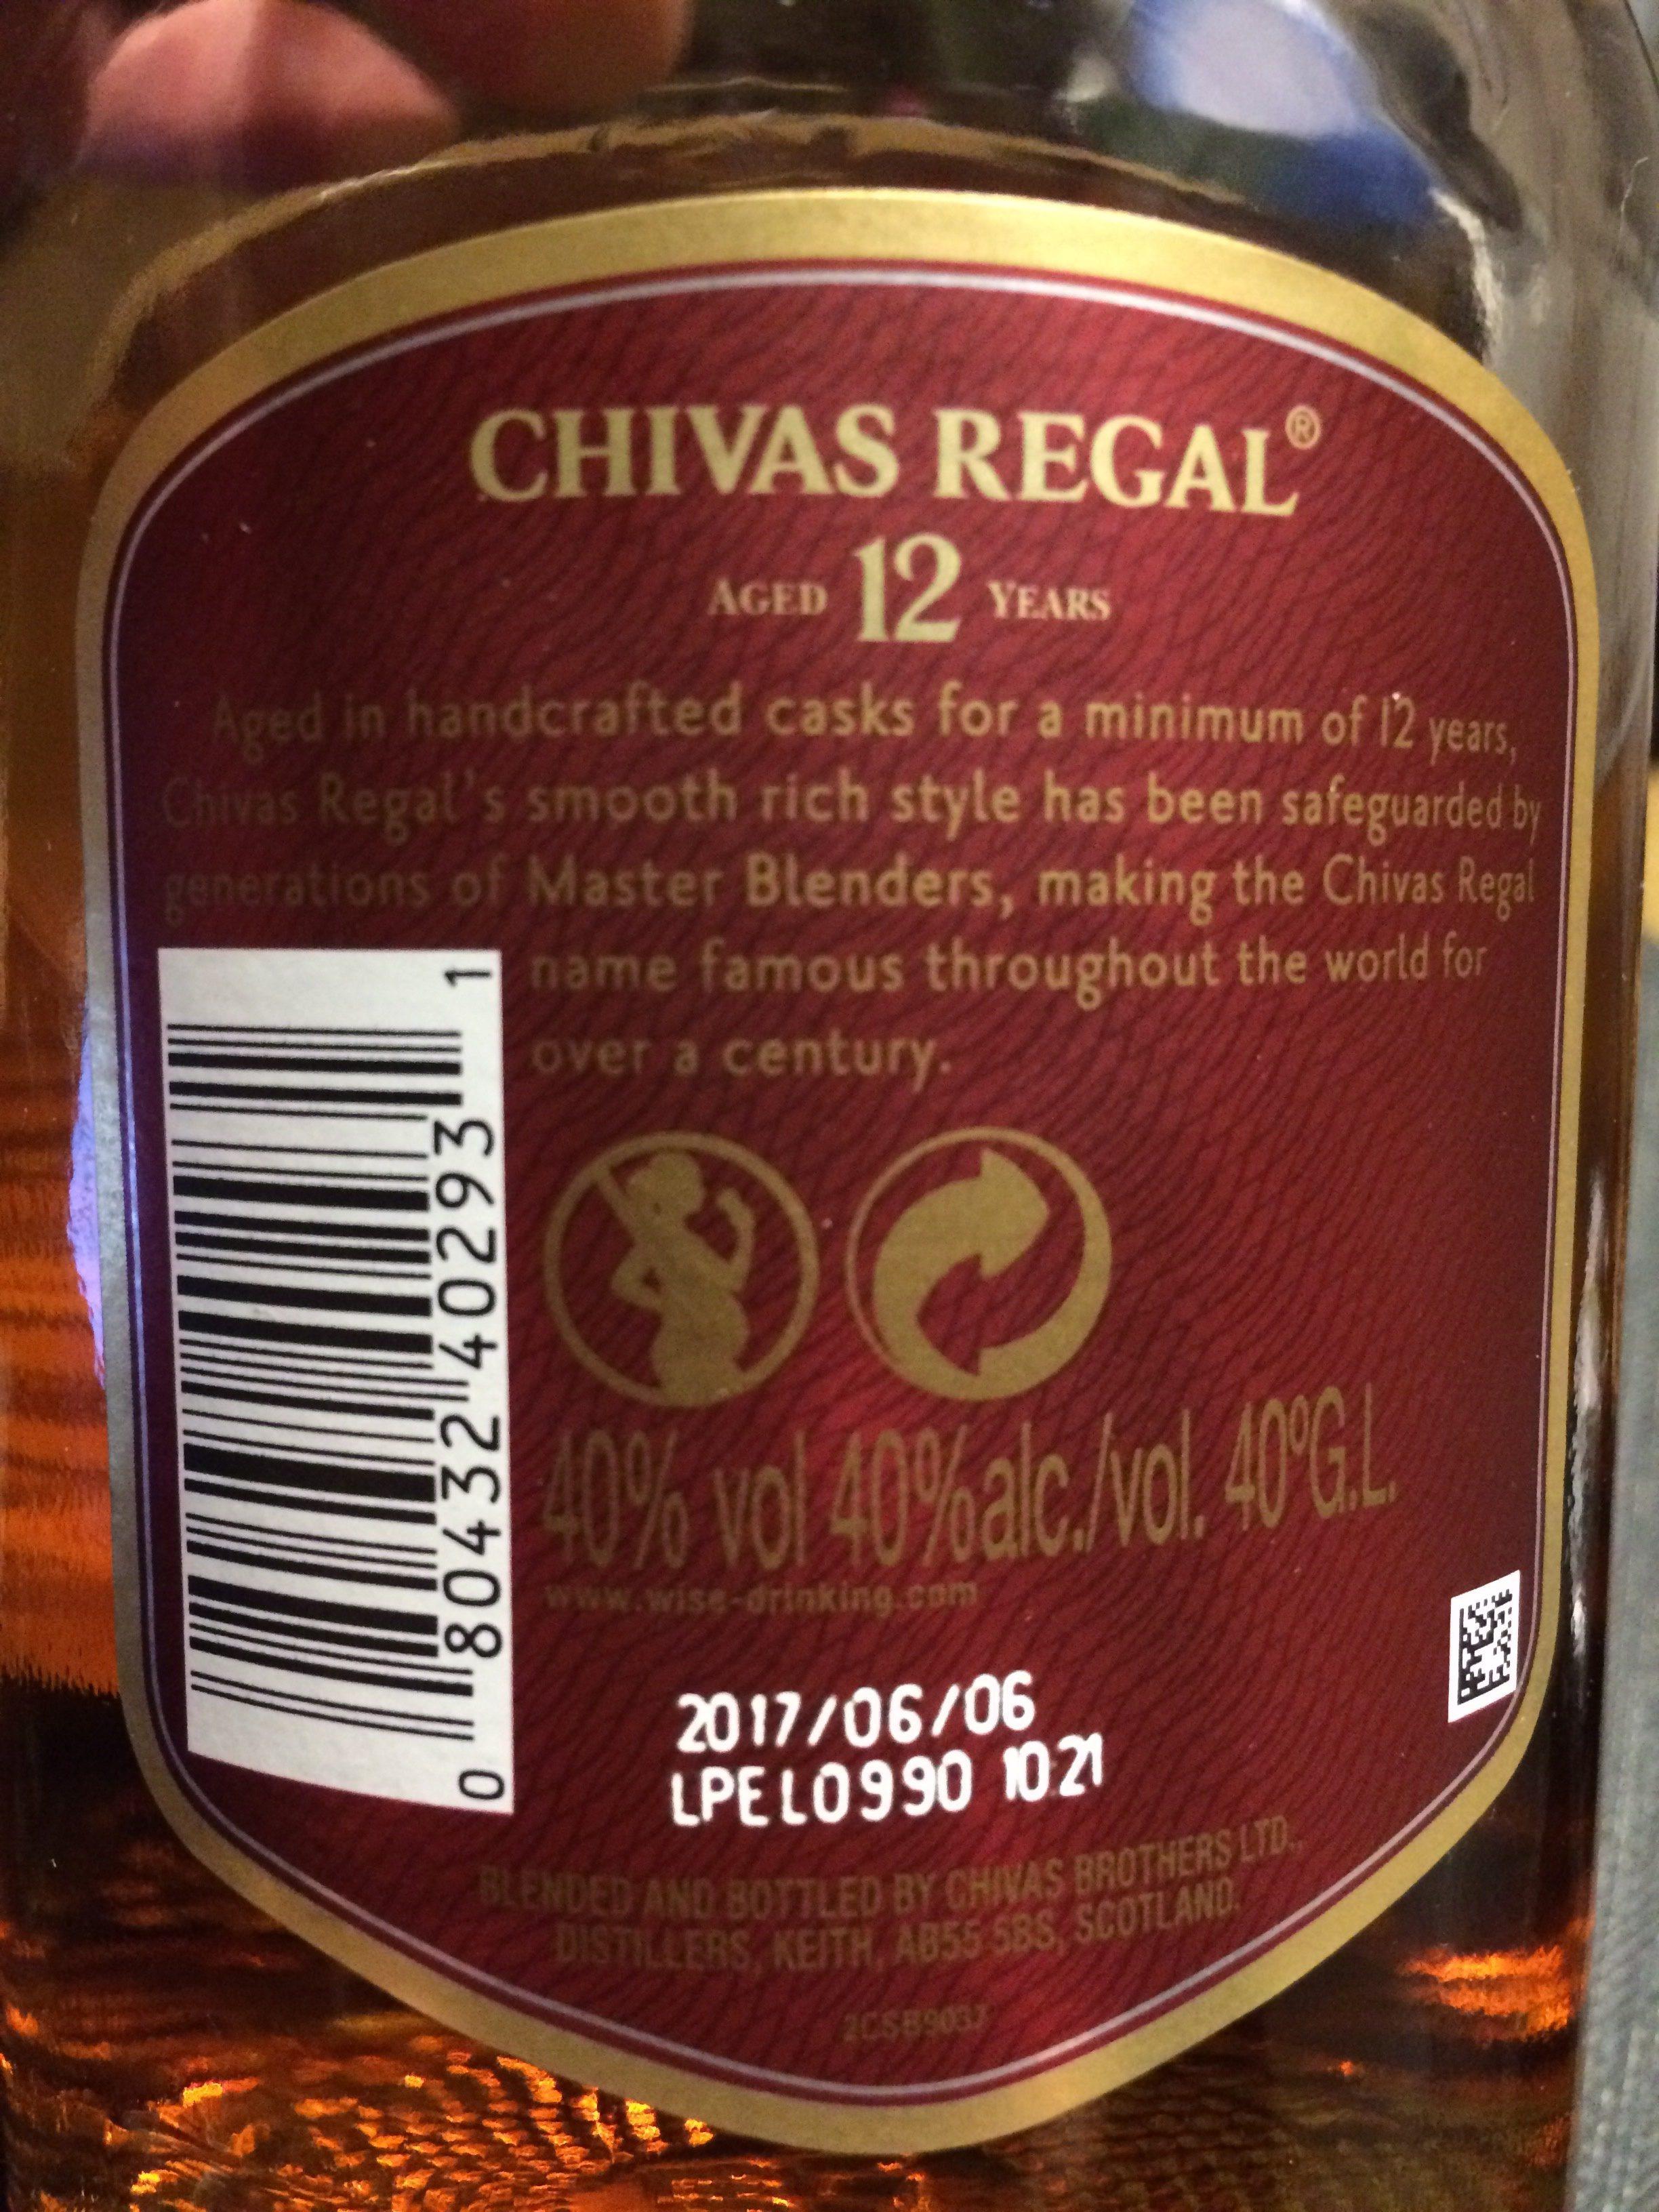 Blended Scotch Whisky aged 12 years - Ingrediënten